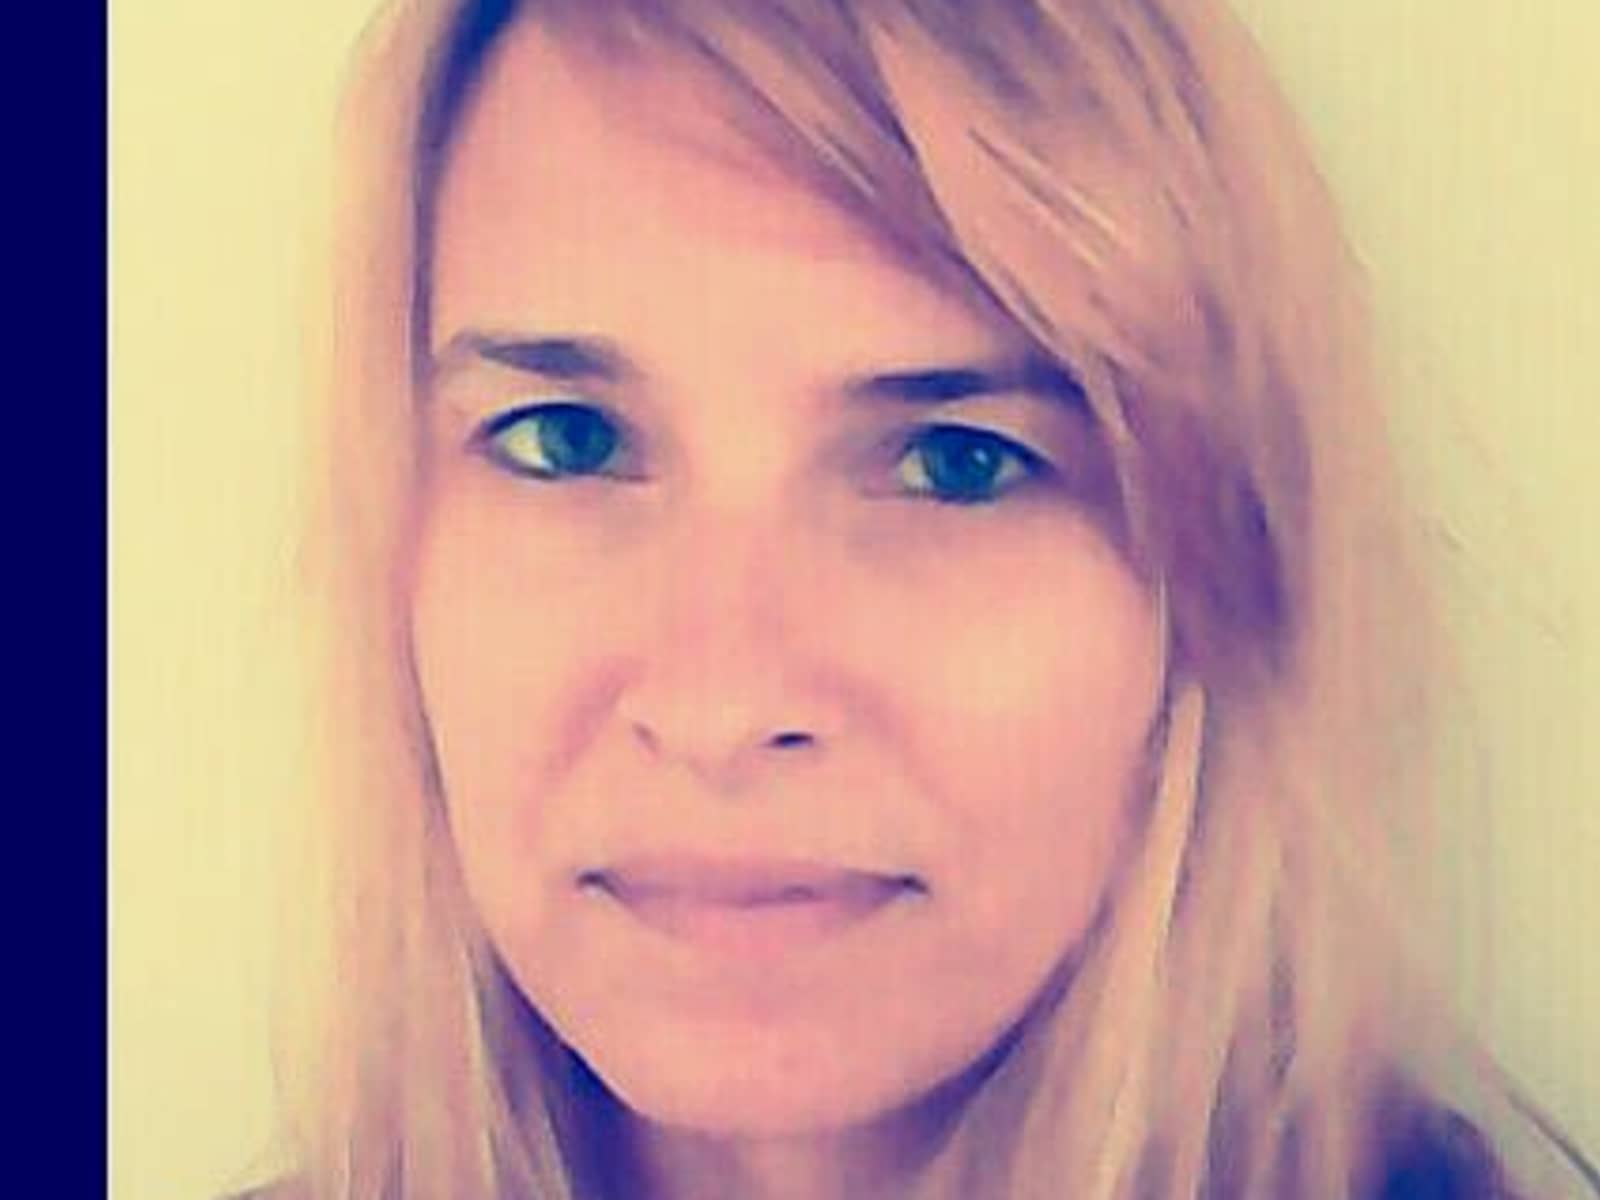 Marlena from Santa Cruz, California, United States